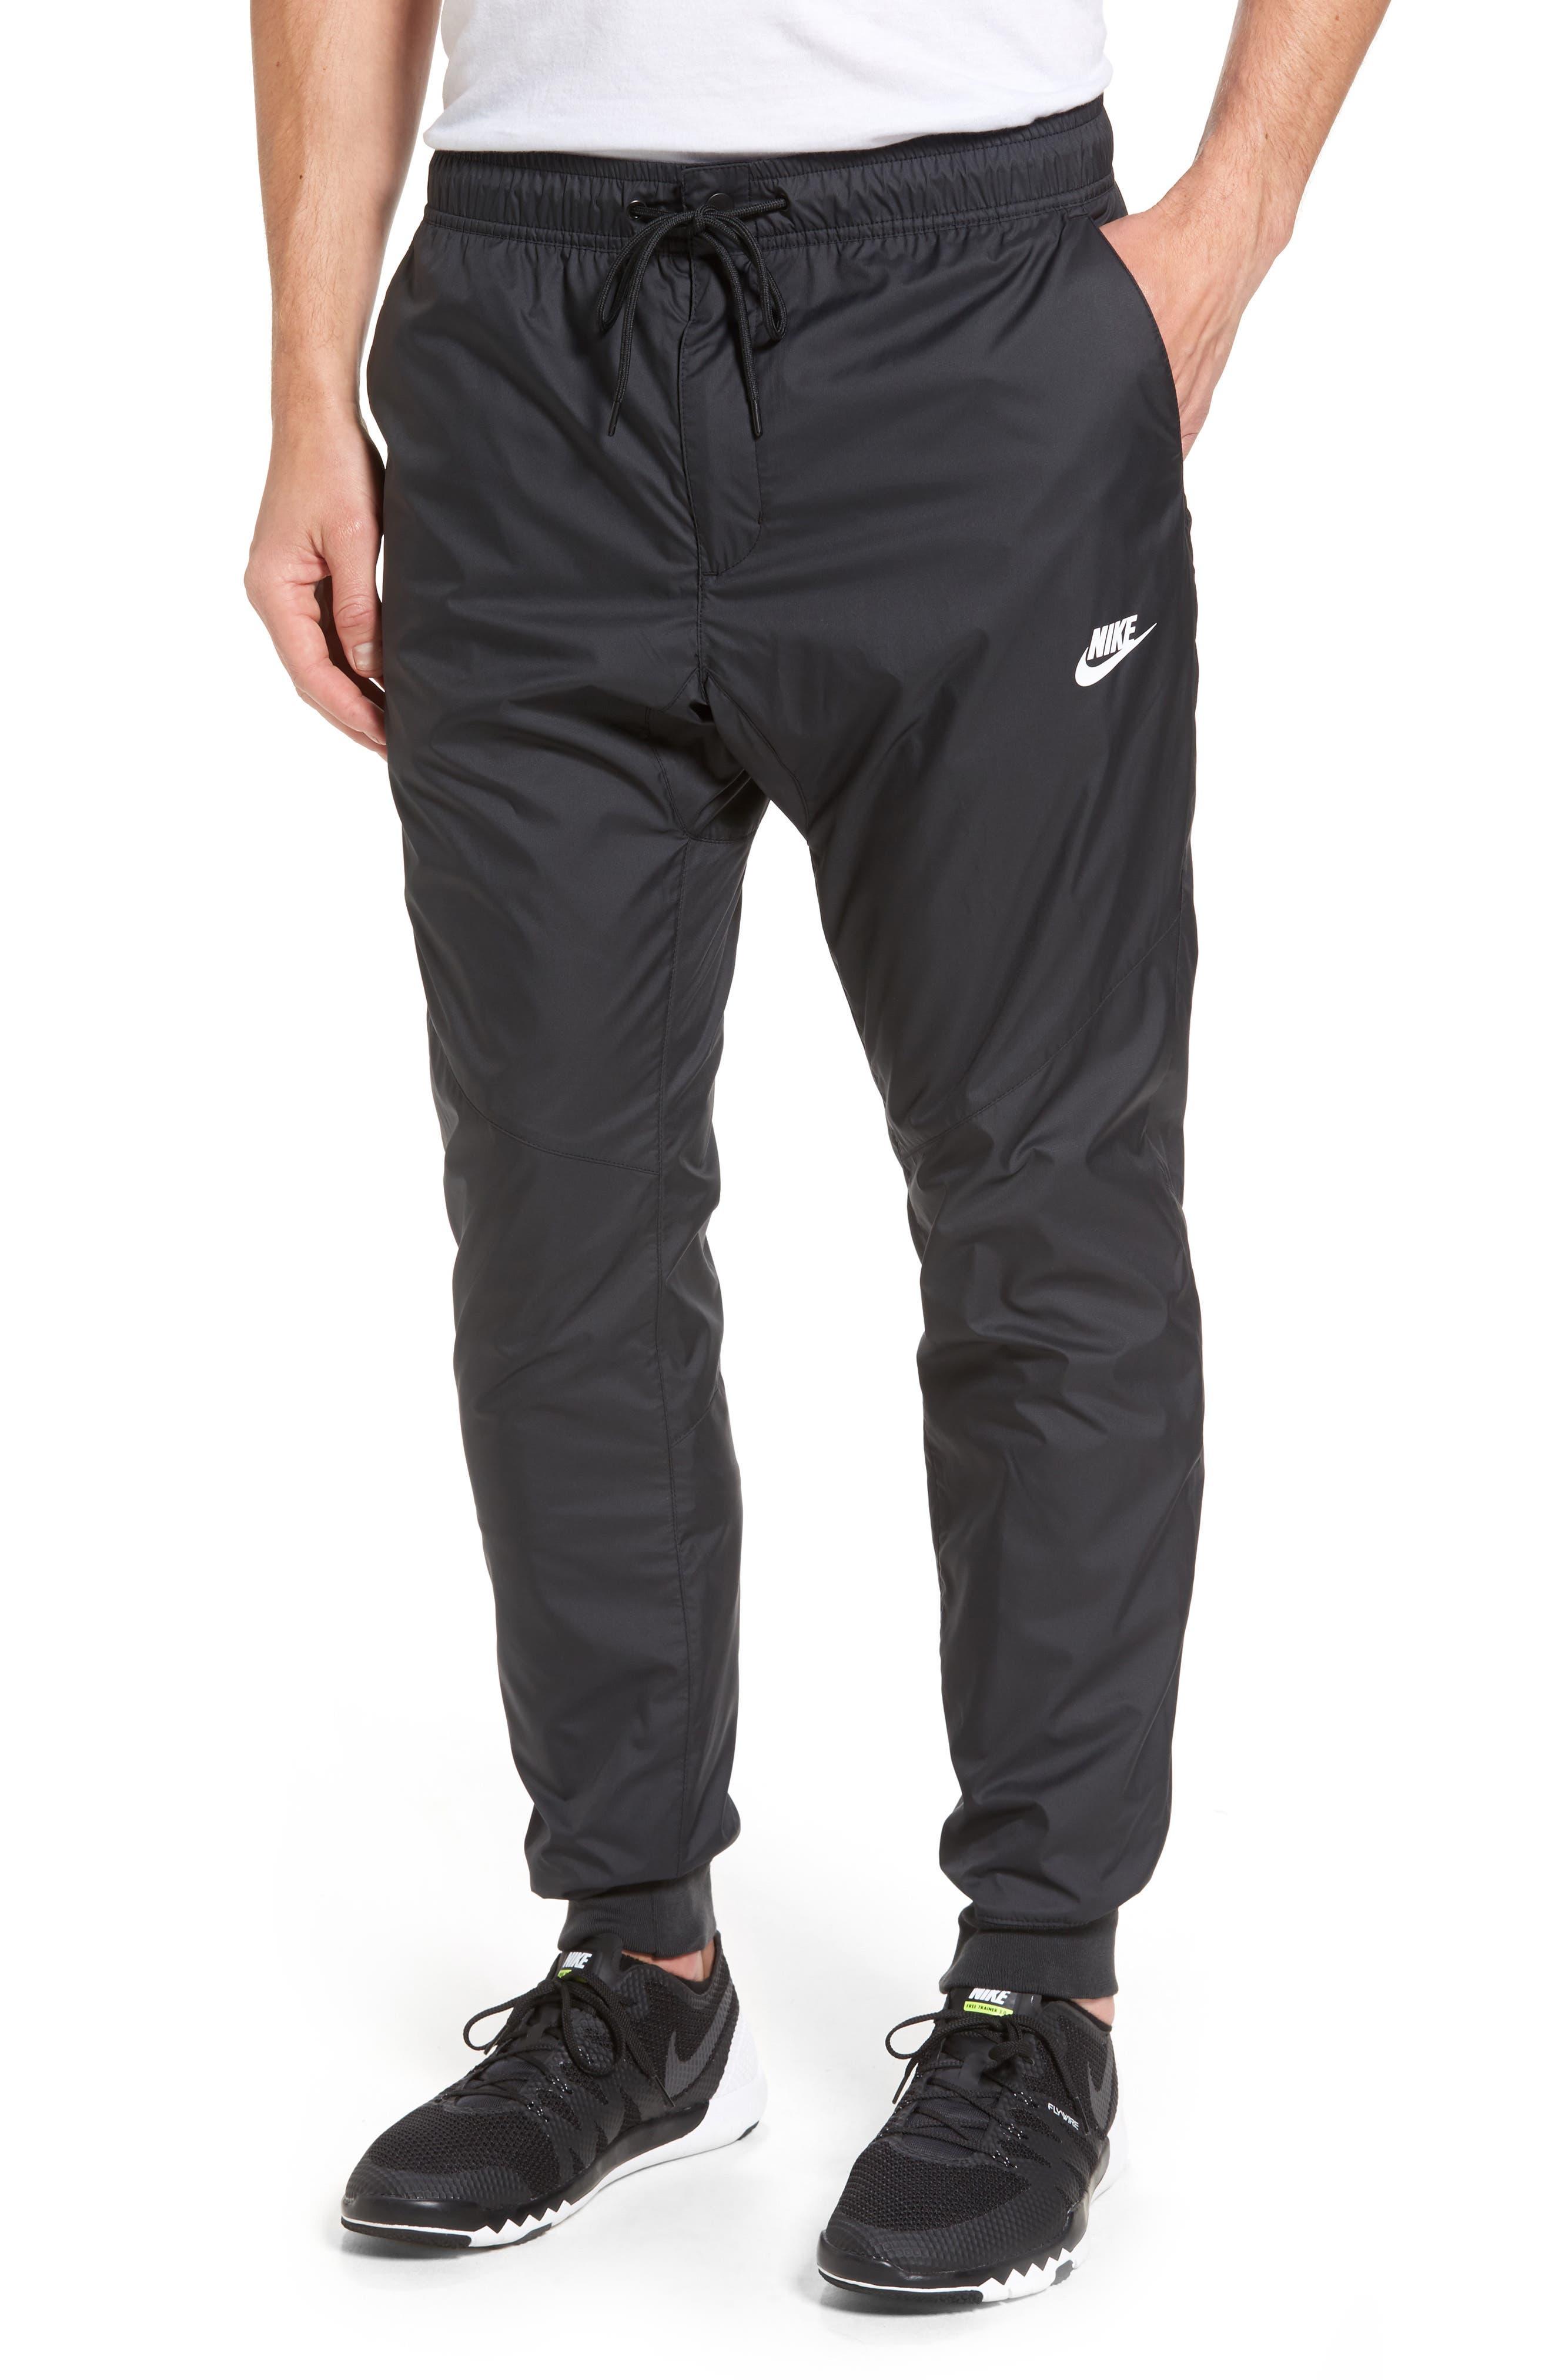 Windrunner Training Pants,                             Main thumbnail 1, color,                             Black/ Black/ Black/ White